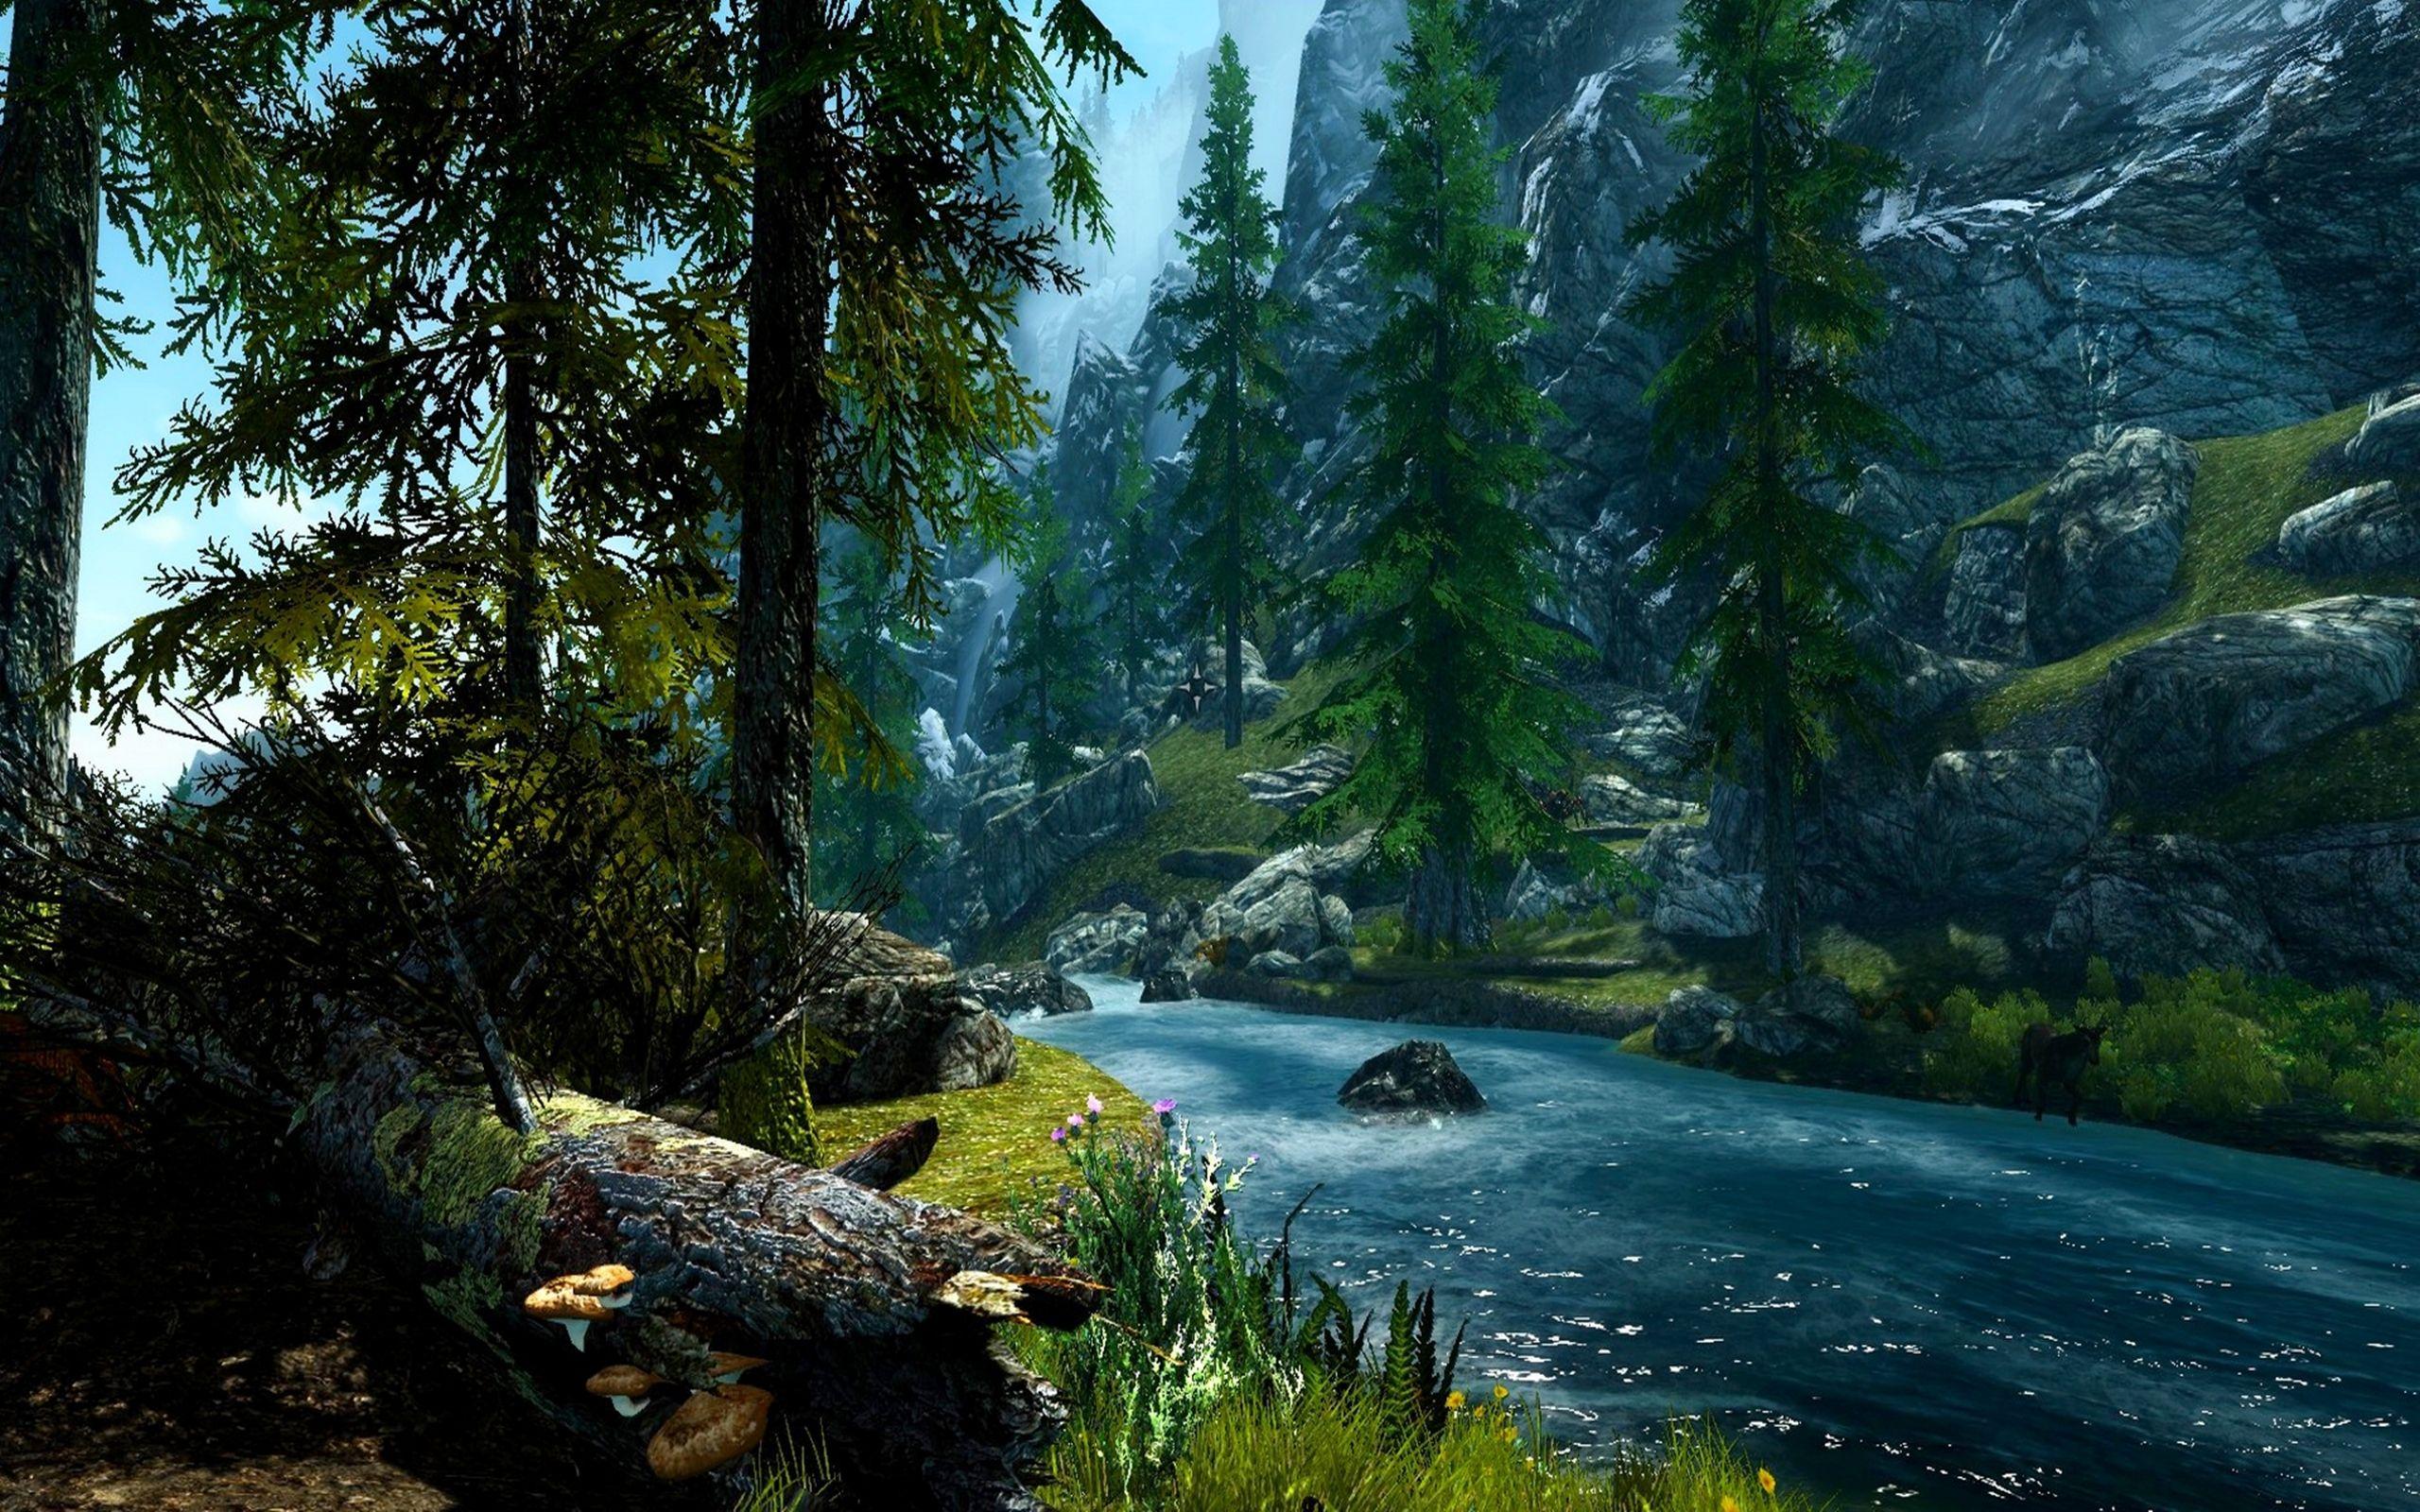 Forest River Wallpaper High Definition #lBT | Earth | Pinterest ...